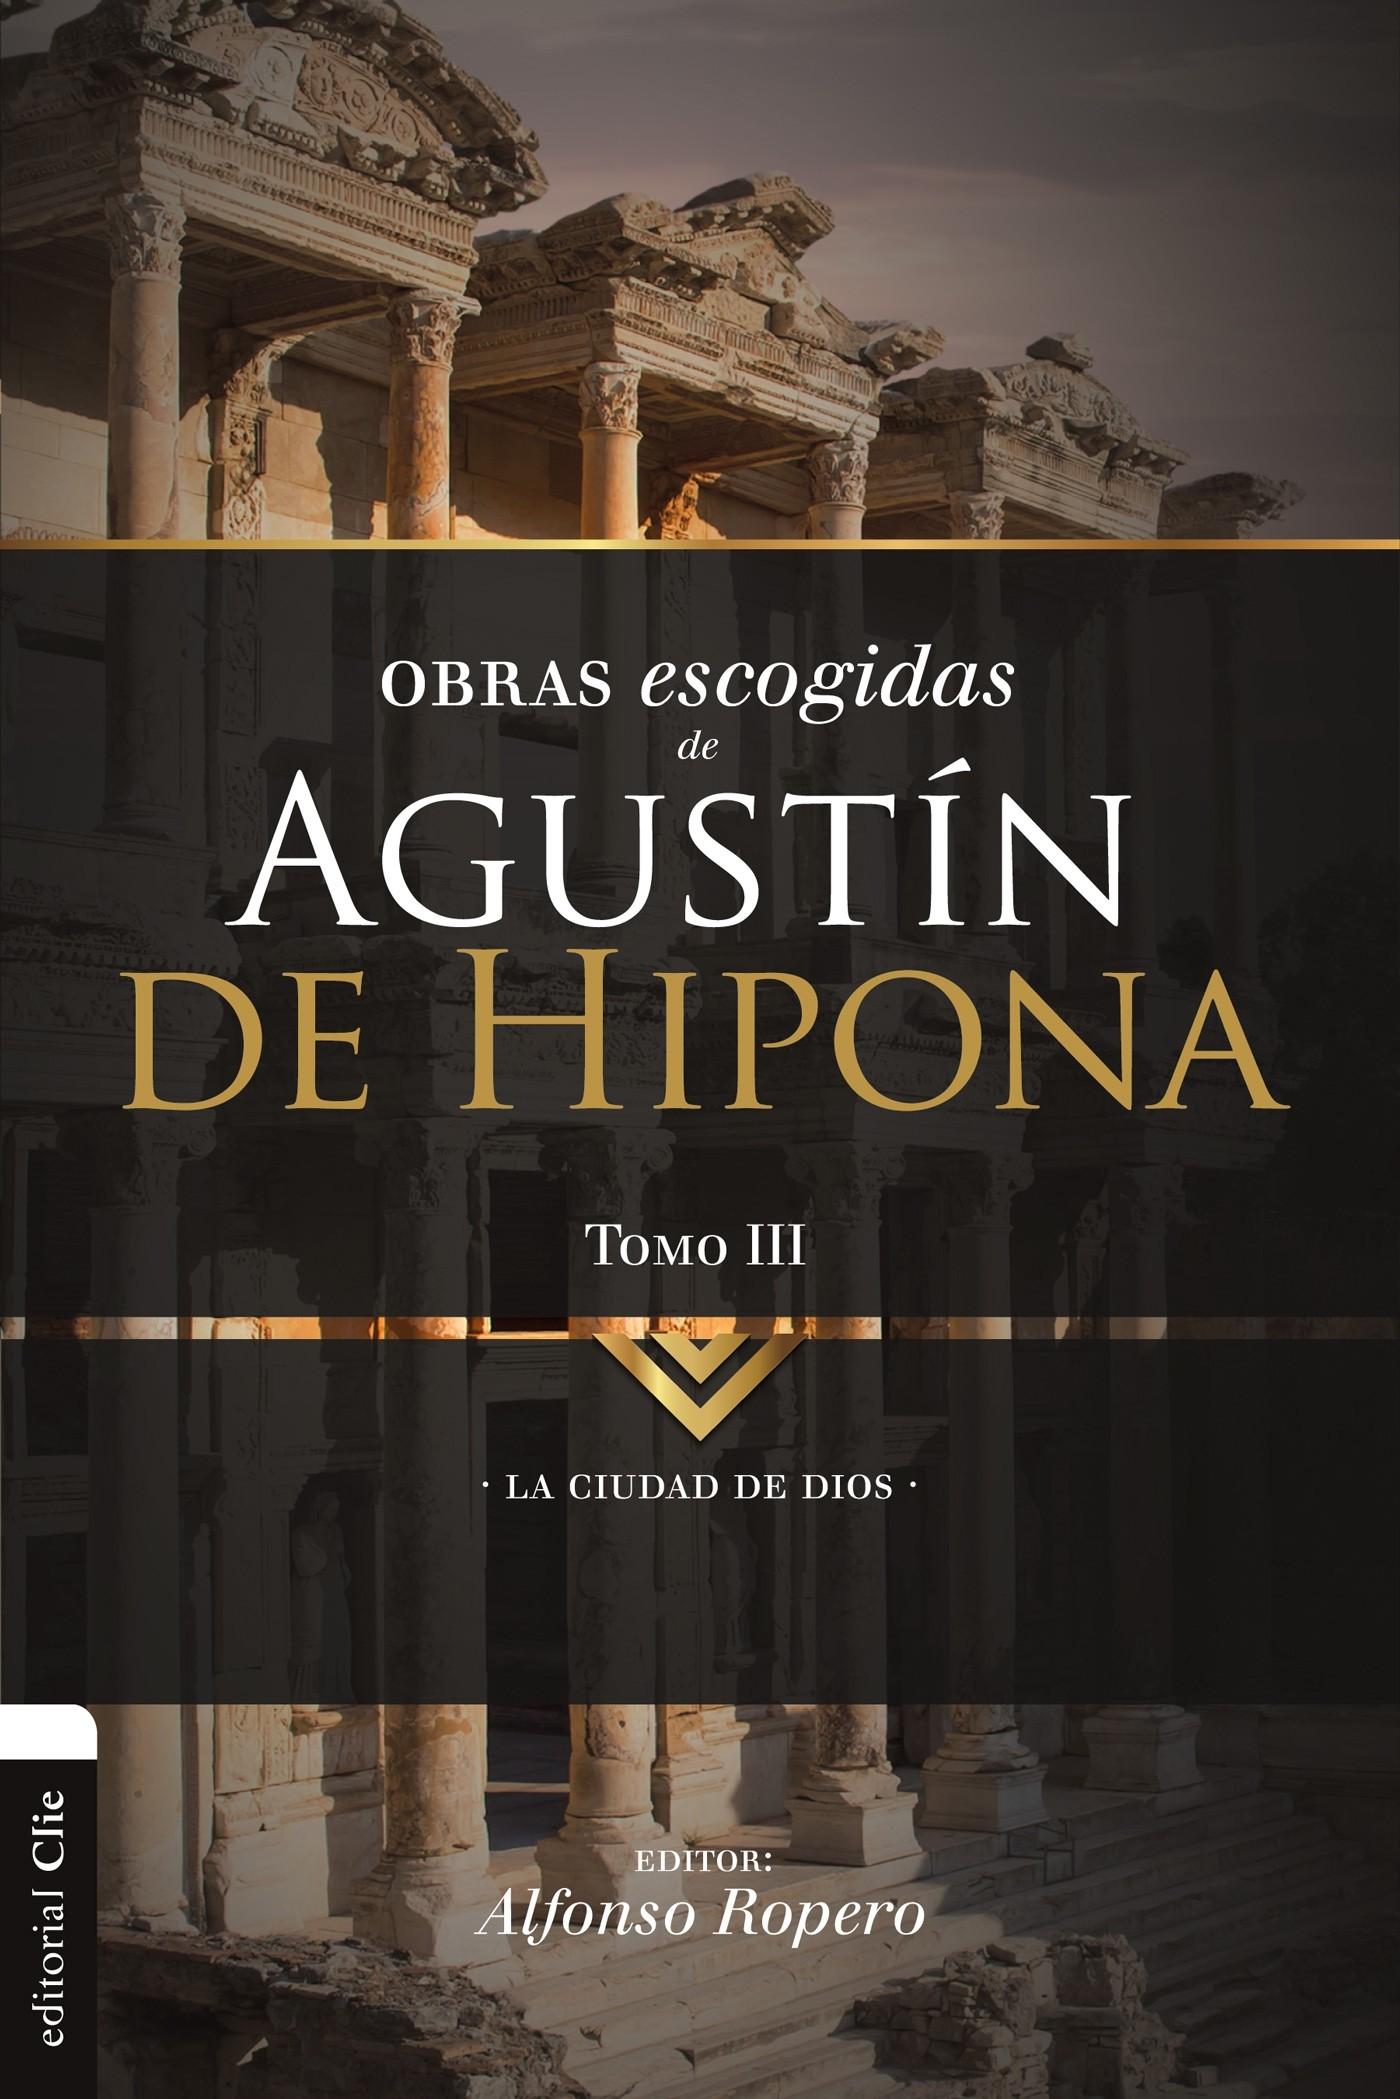 Obras escogidas de Agustín de Hipona Tomo 3